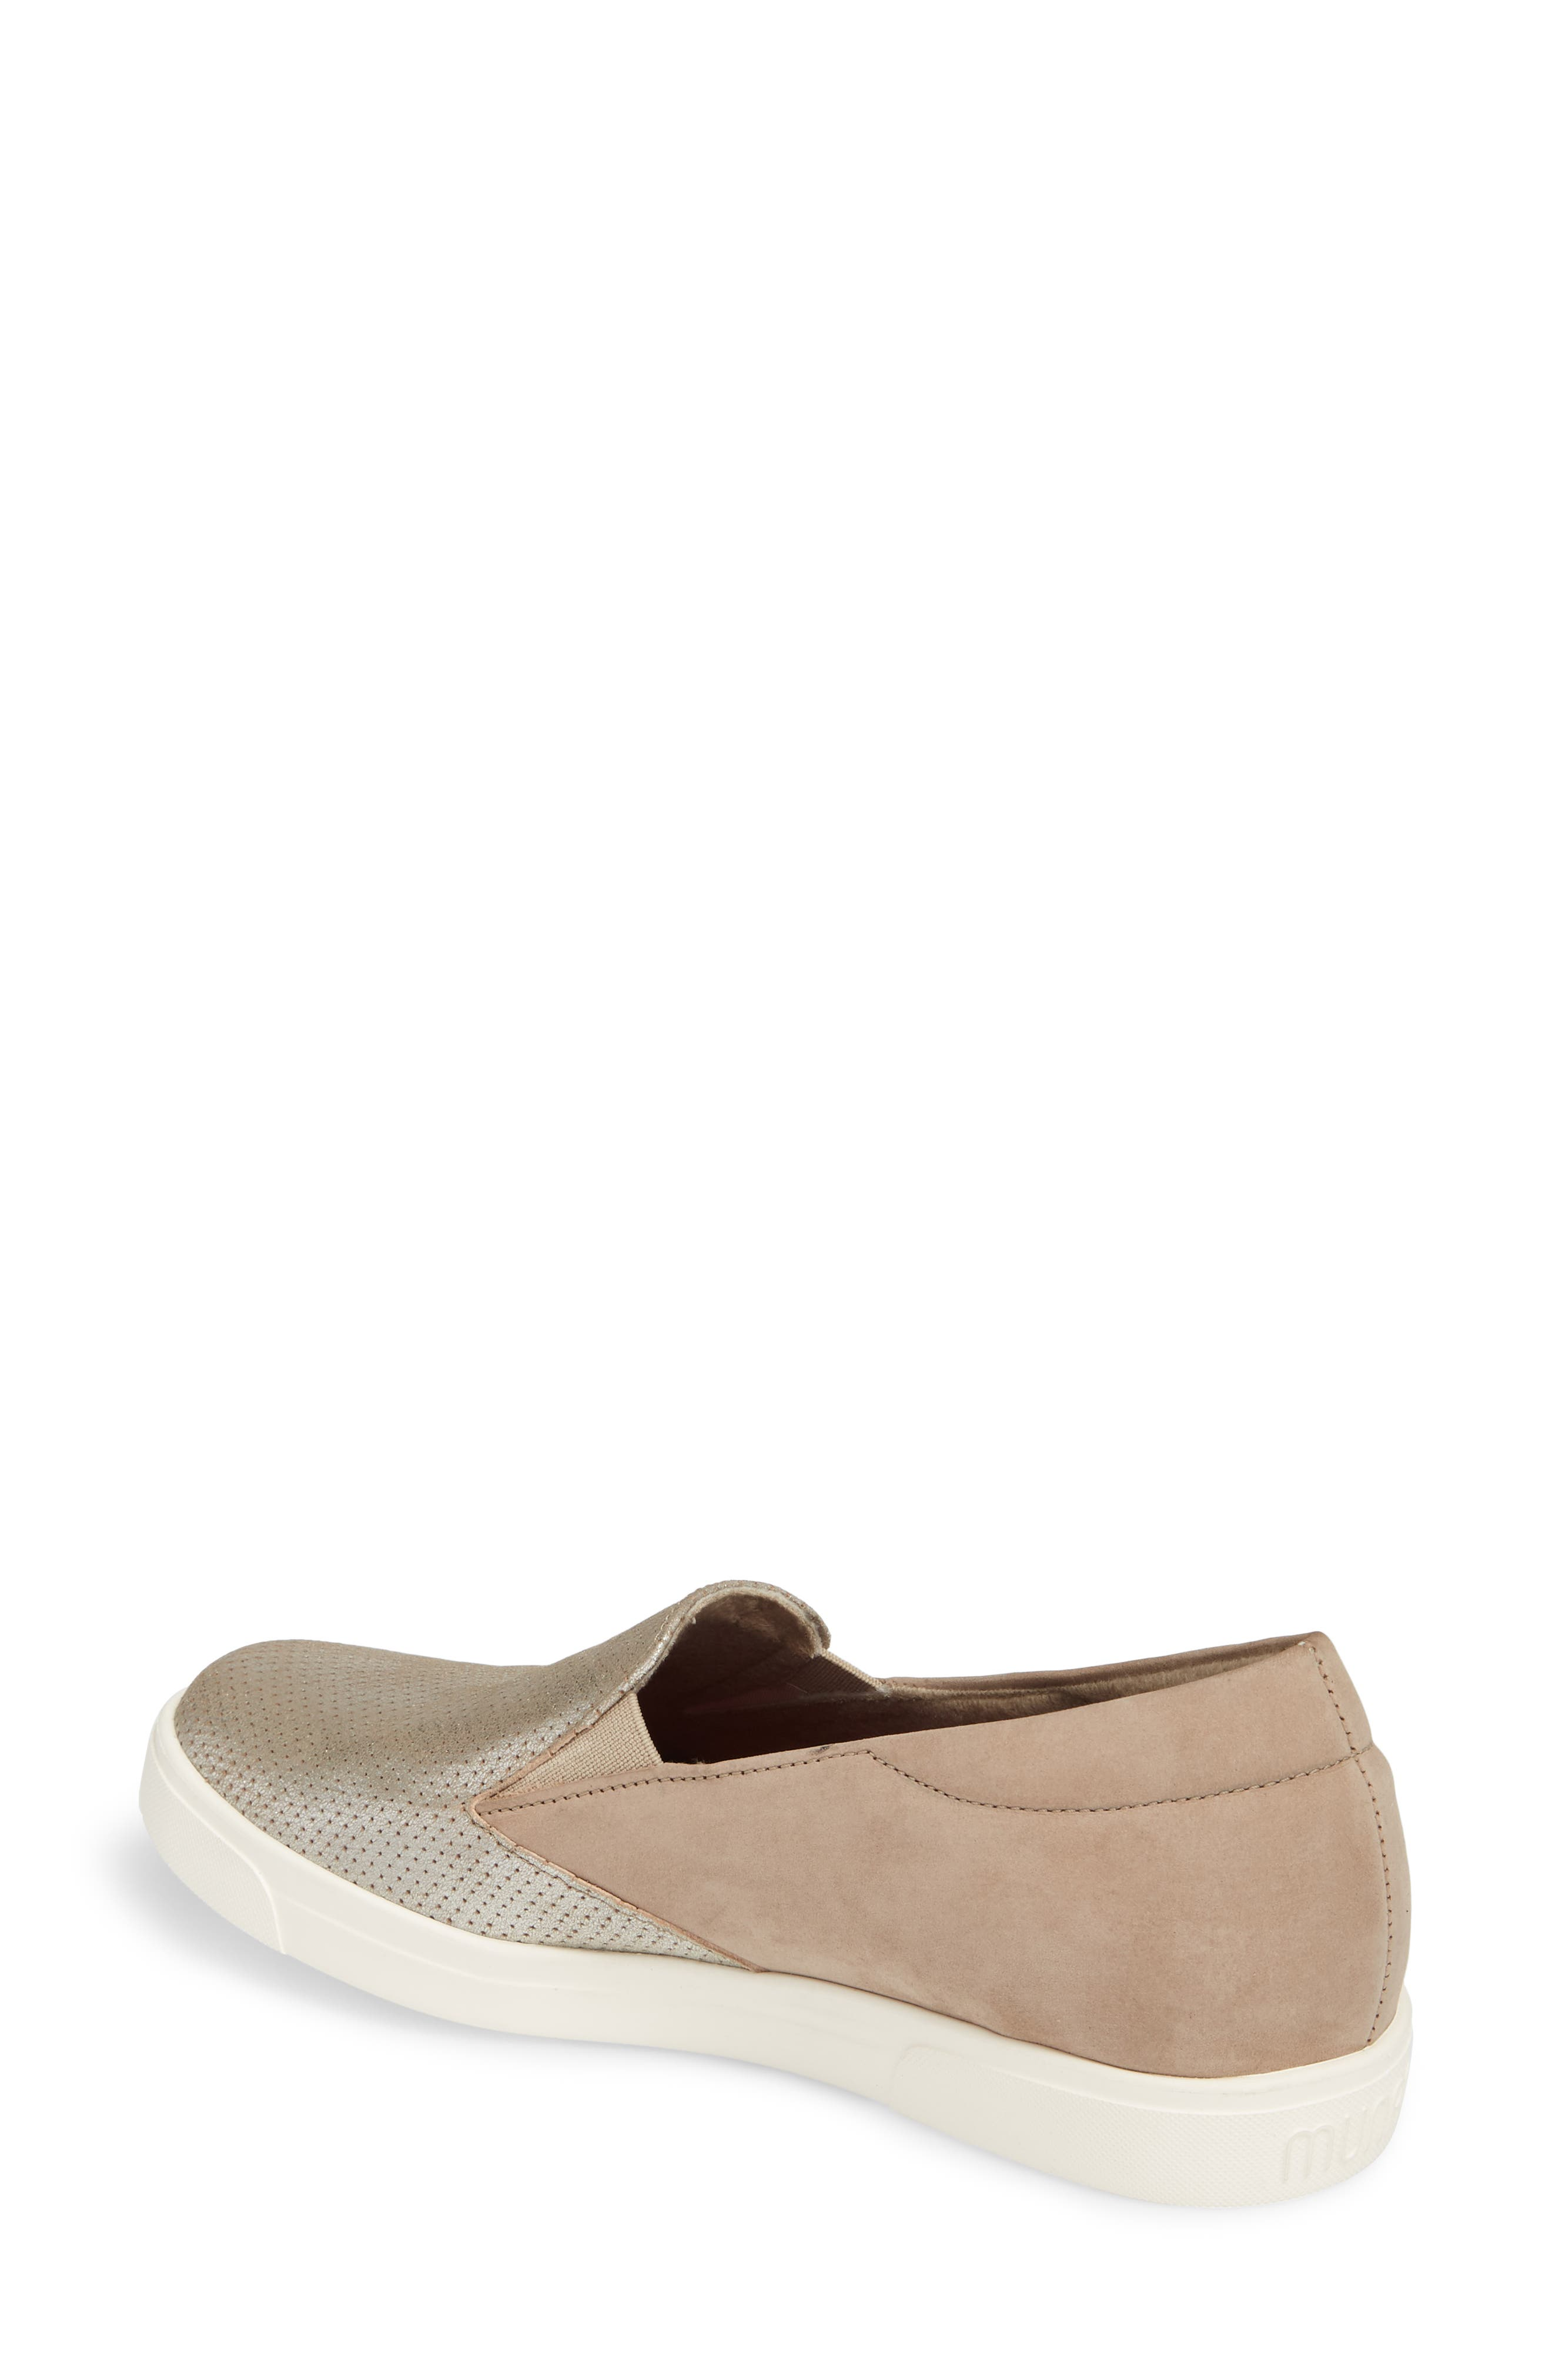 Lulu Slip-On Sneaker,                             Alternate thumbnail 2, color,                             Brushed Silver Nubuck